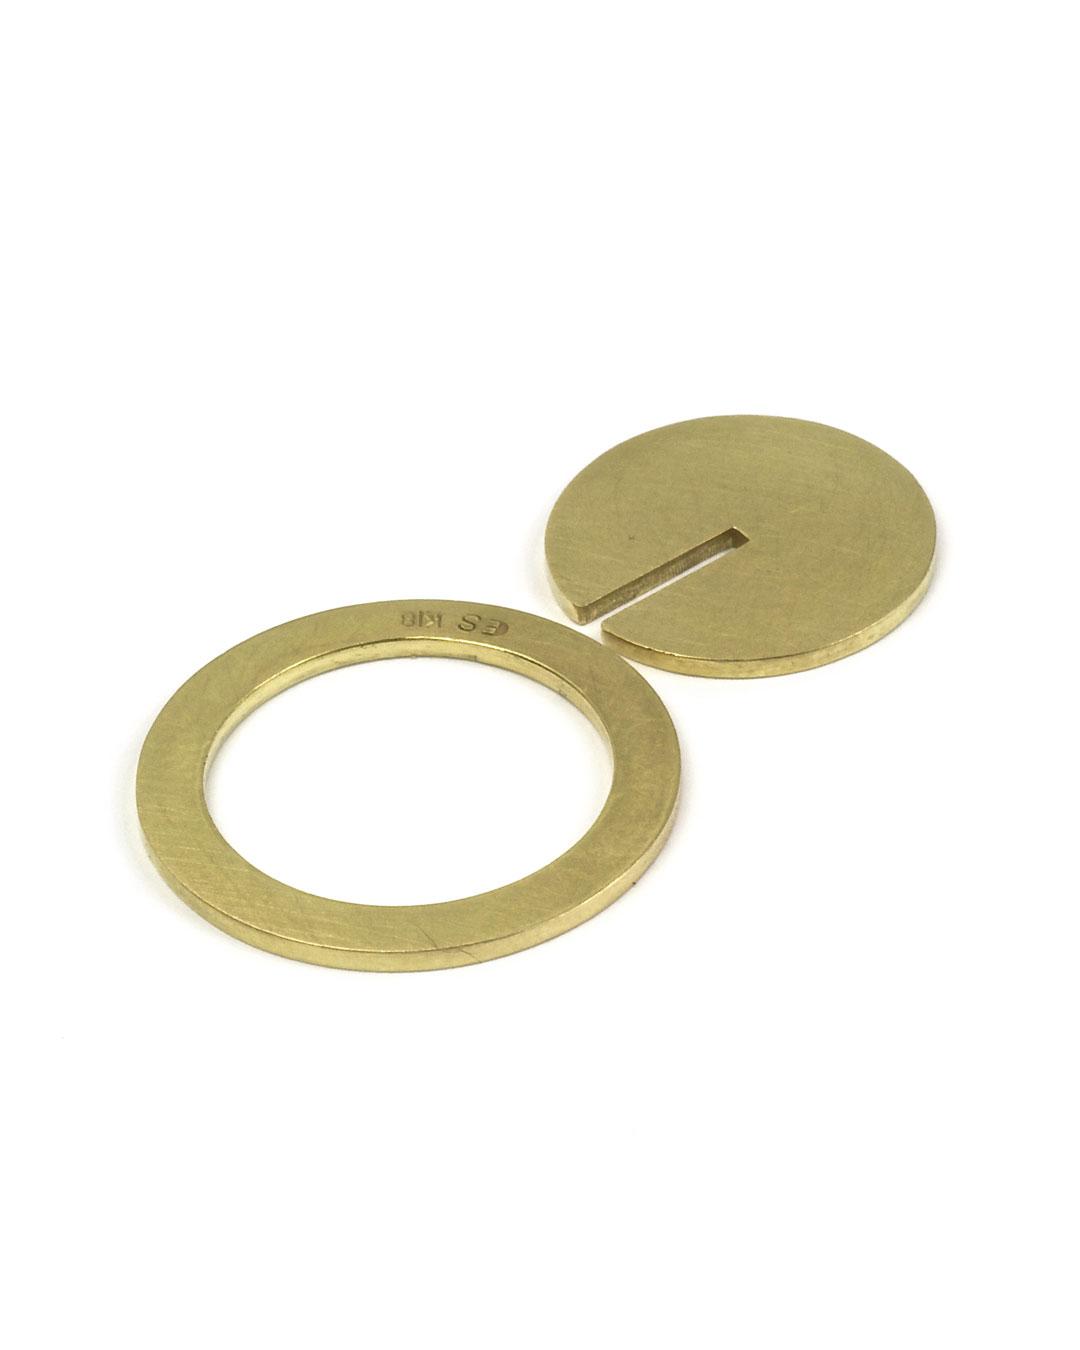 Etsuko Sonobe, untitled, 2002, ring; gold, ø 20 x 1 mm, €2400